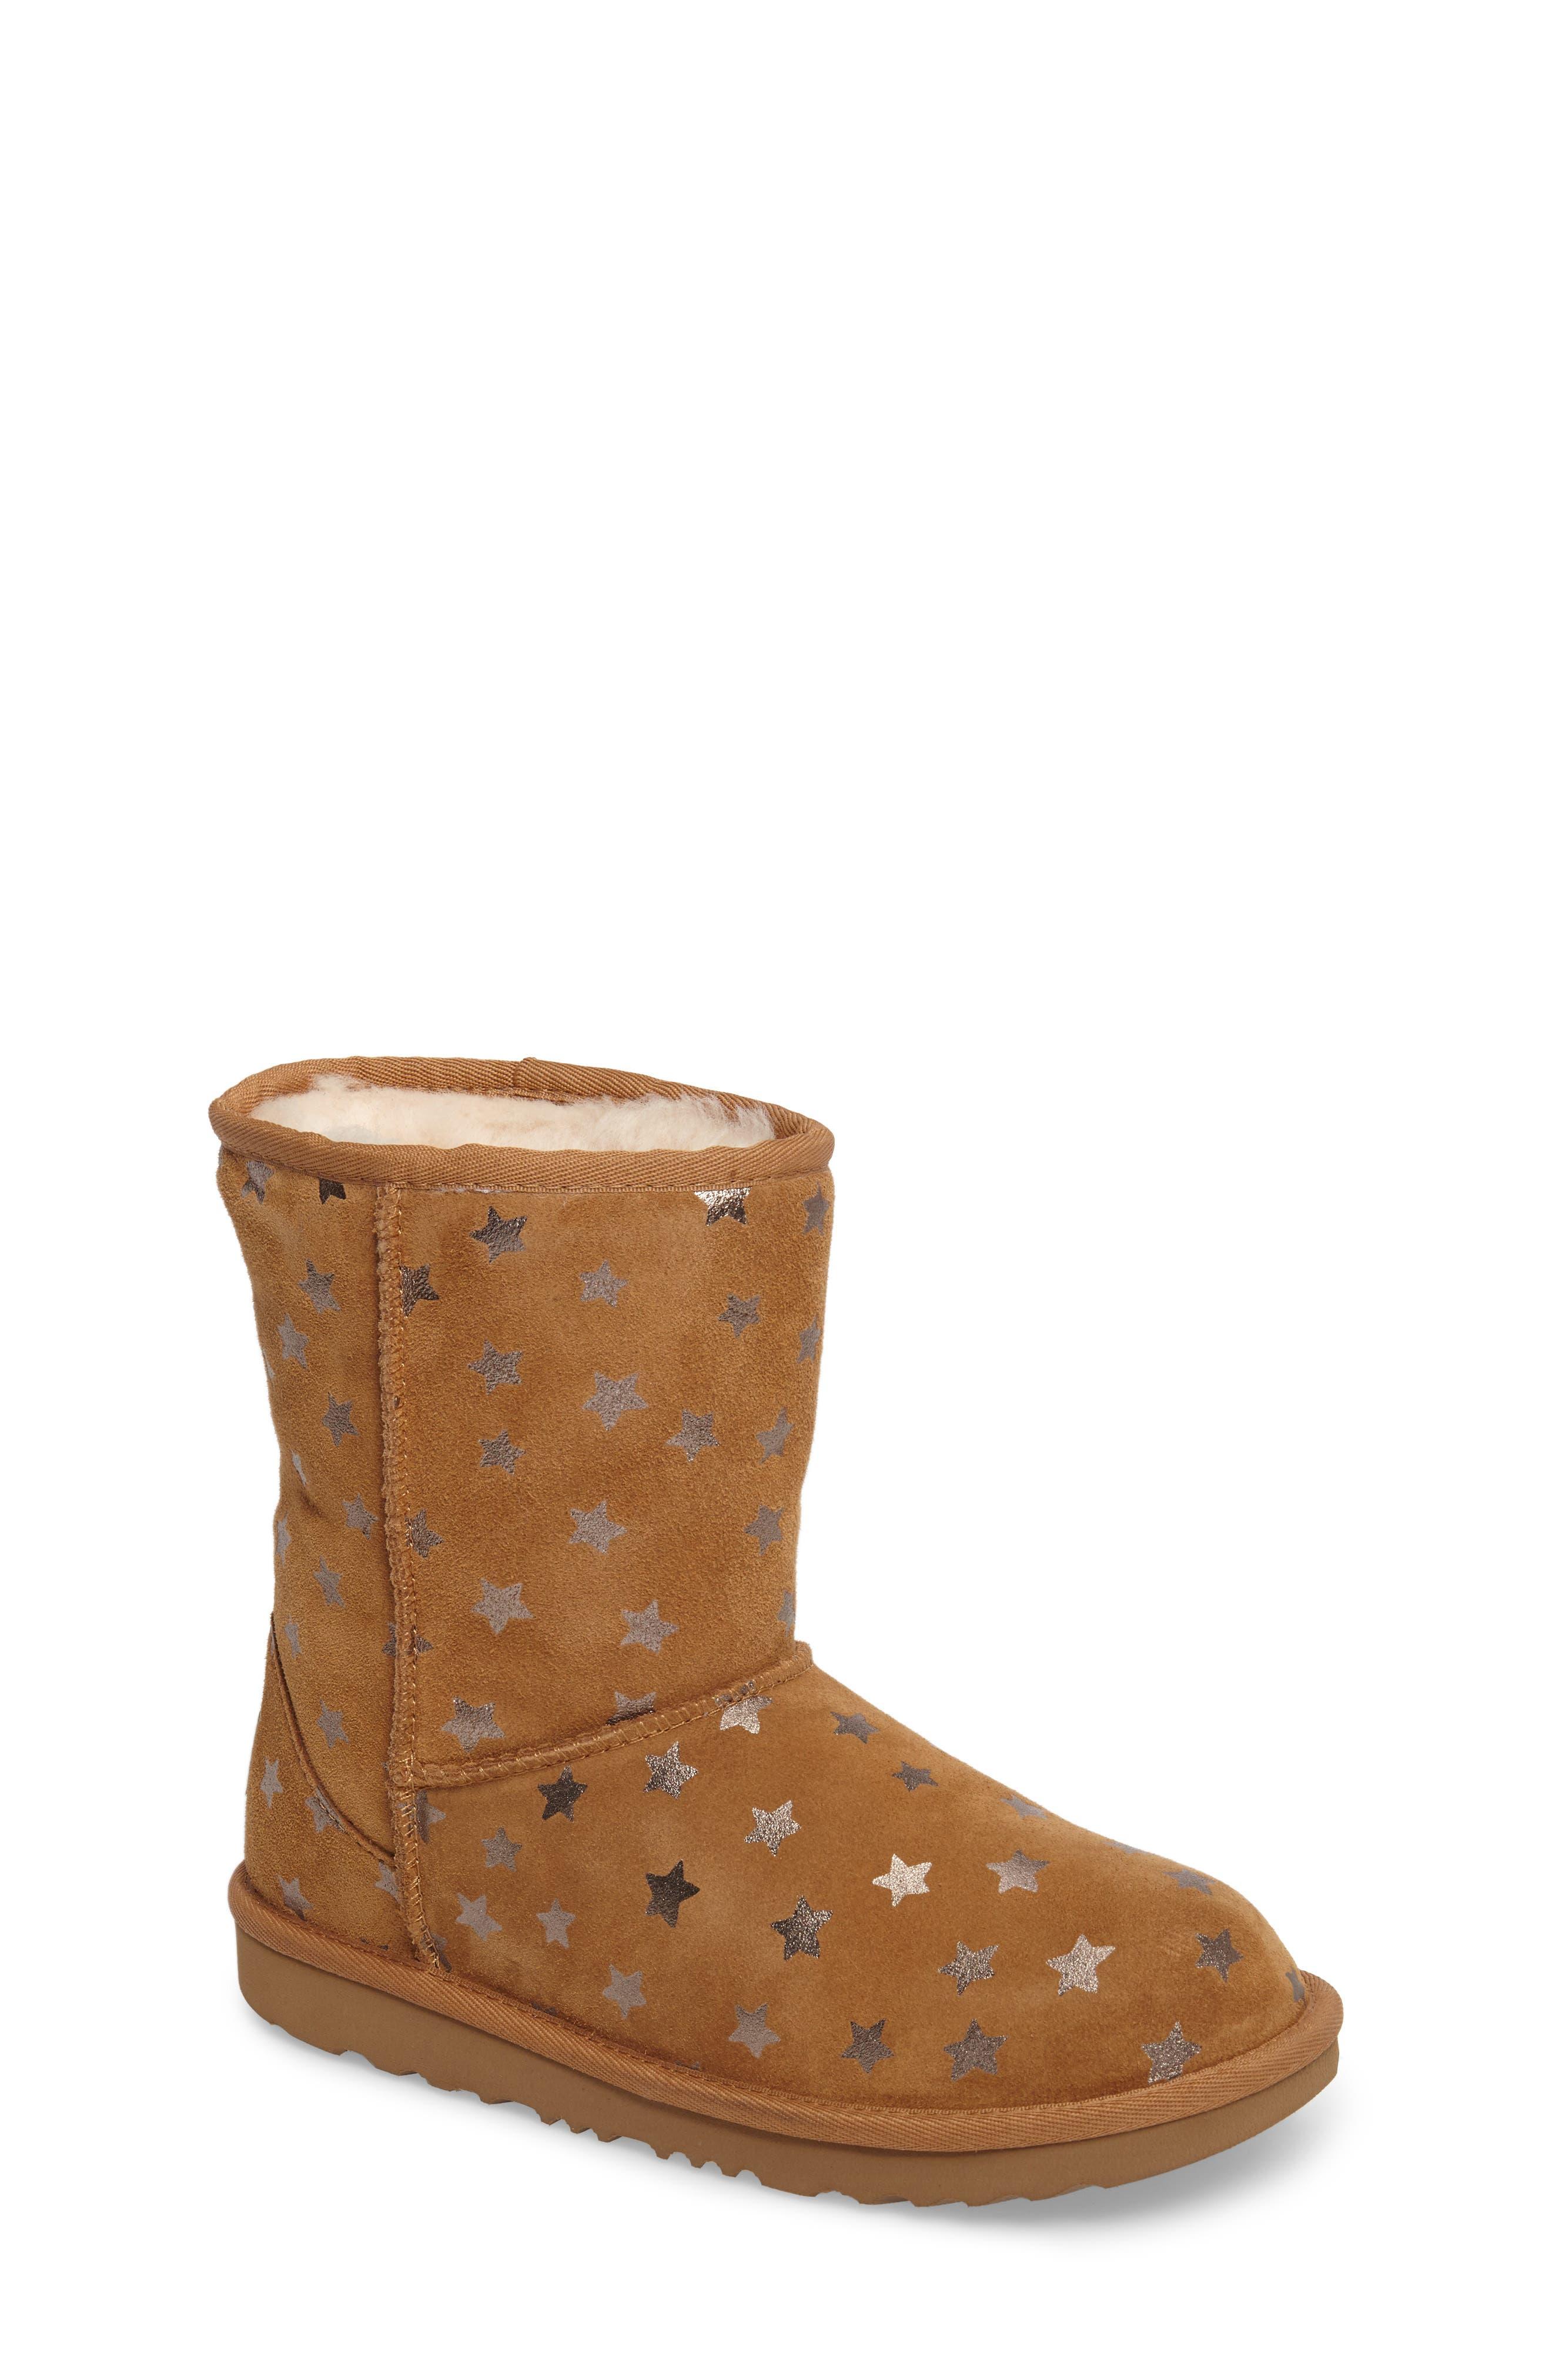 UGG® Classic Short II Water-Resistant Genuine Shearling Stars Boot (Walker, Toddler, Little Kid & Big Kid)